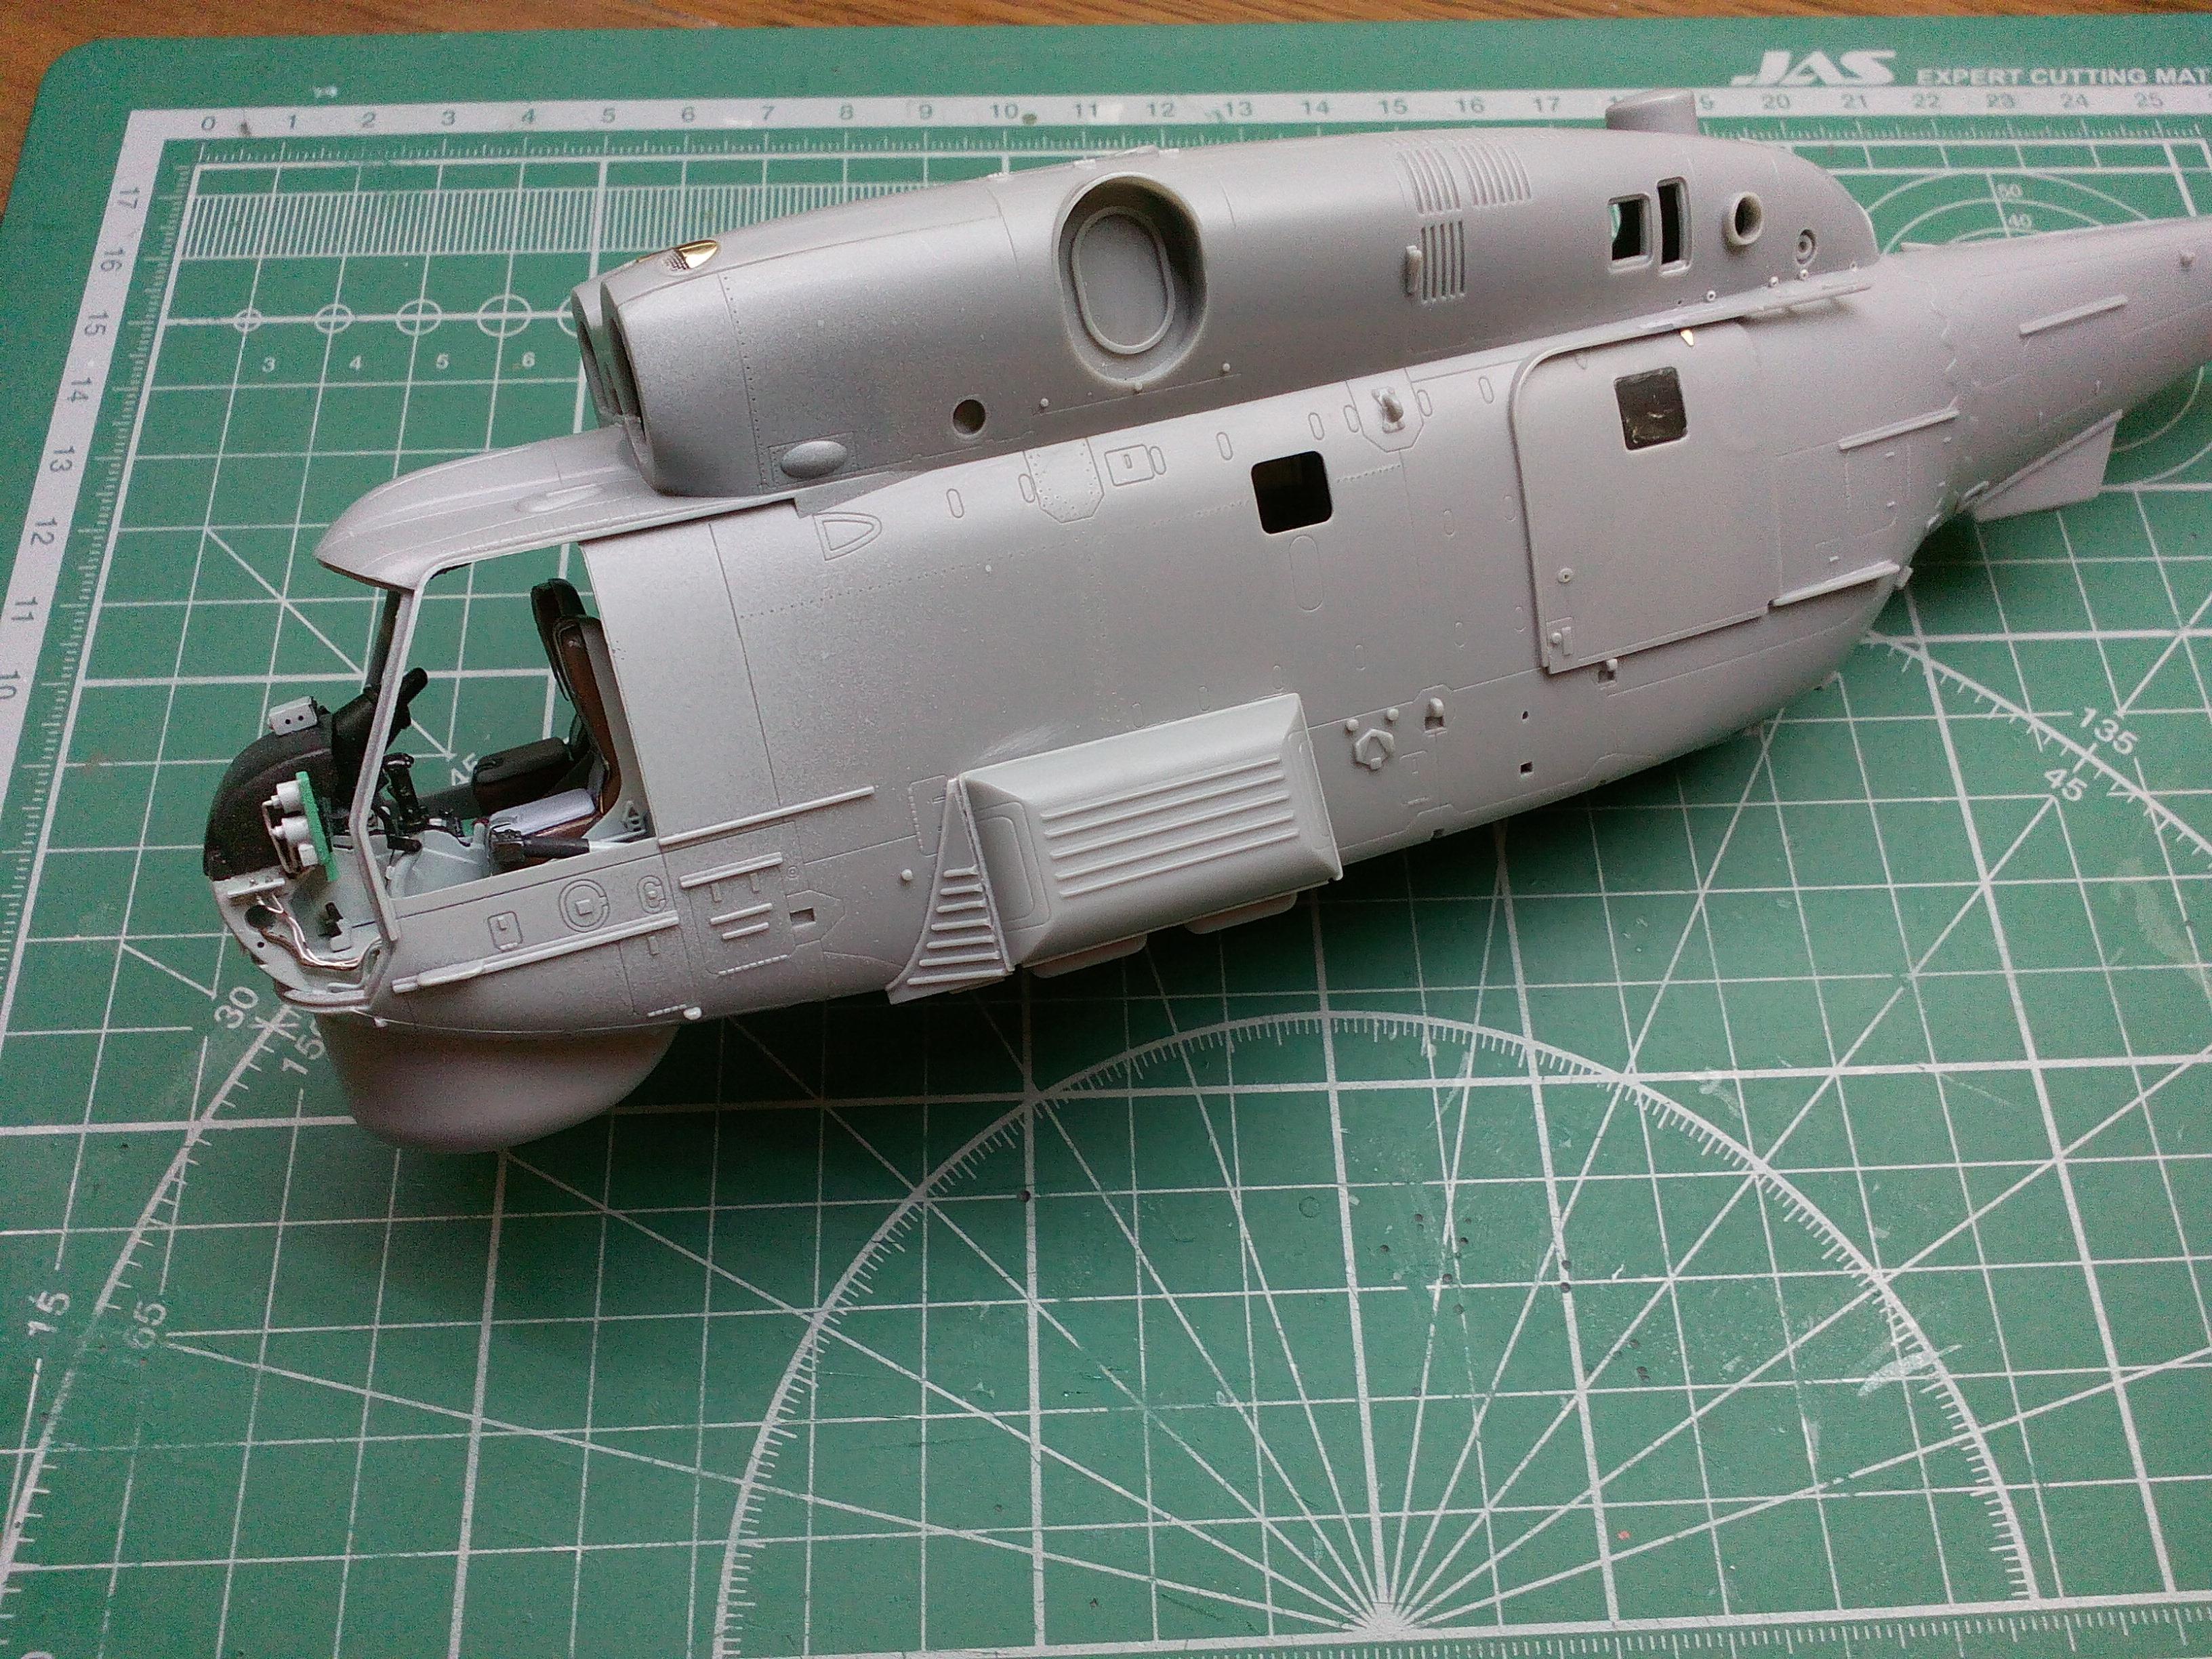 Ка-27ПЛ 1/48 HOBBYBOSS - Страница 2 518f9e8900dc